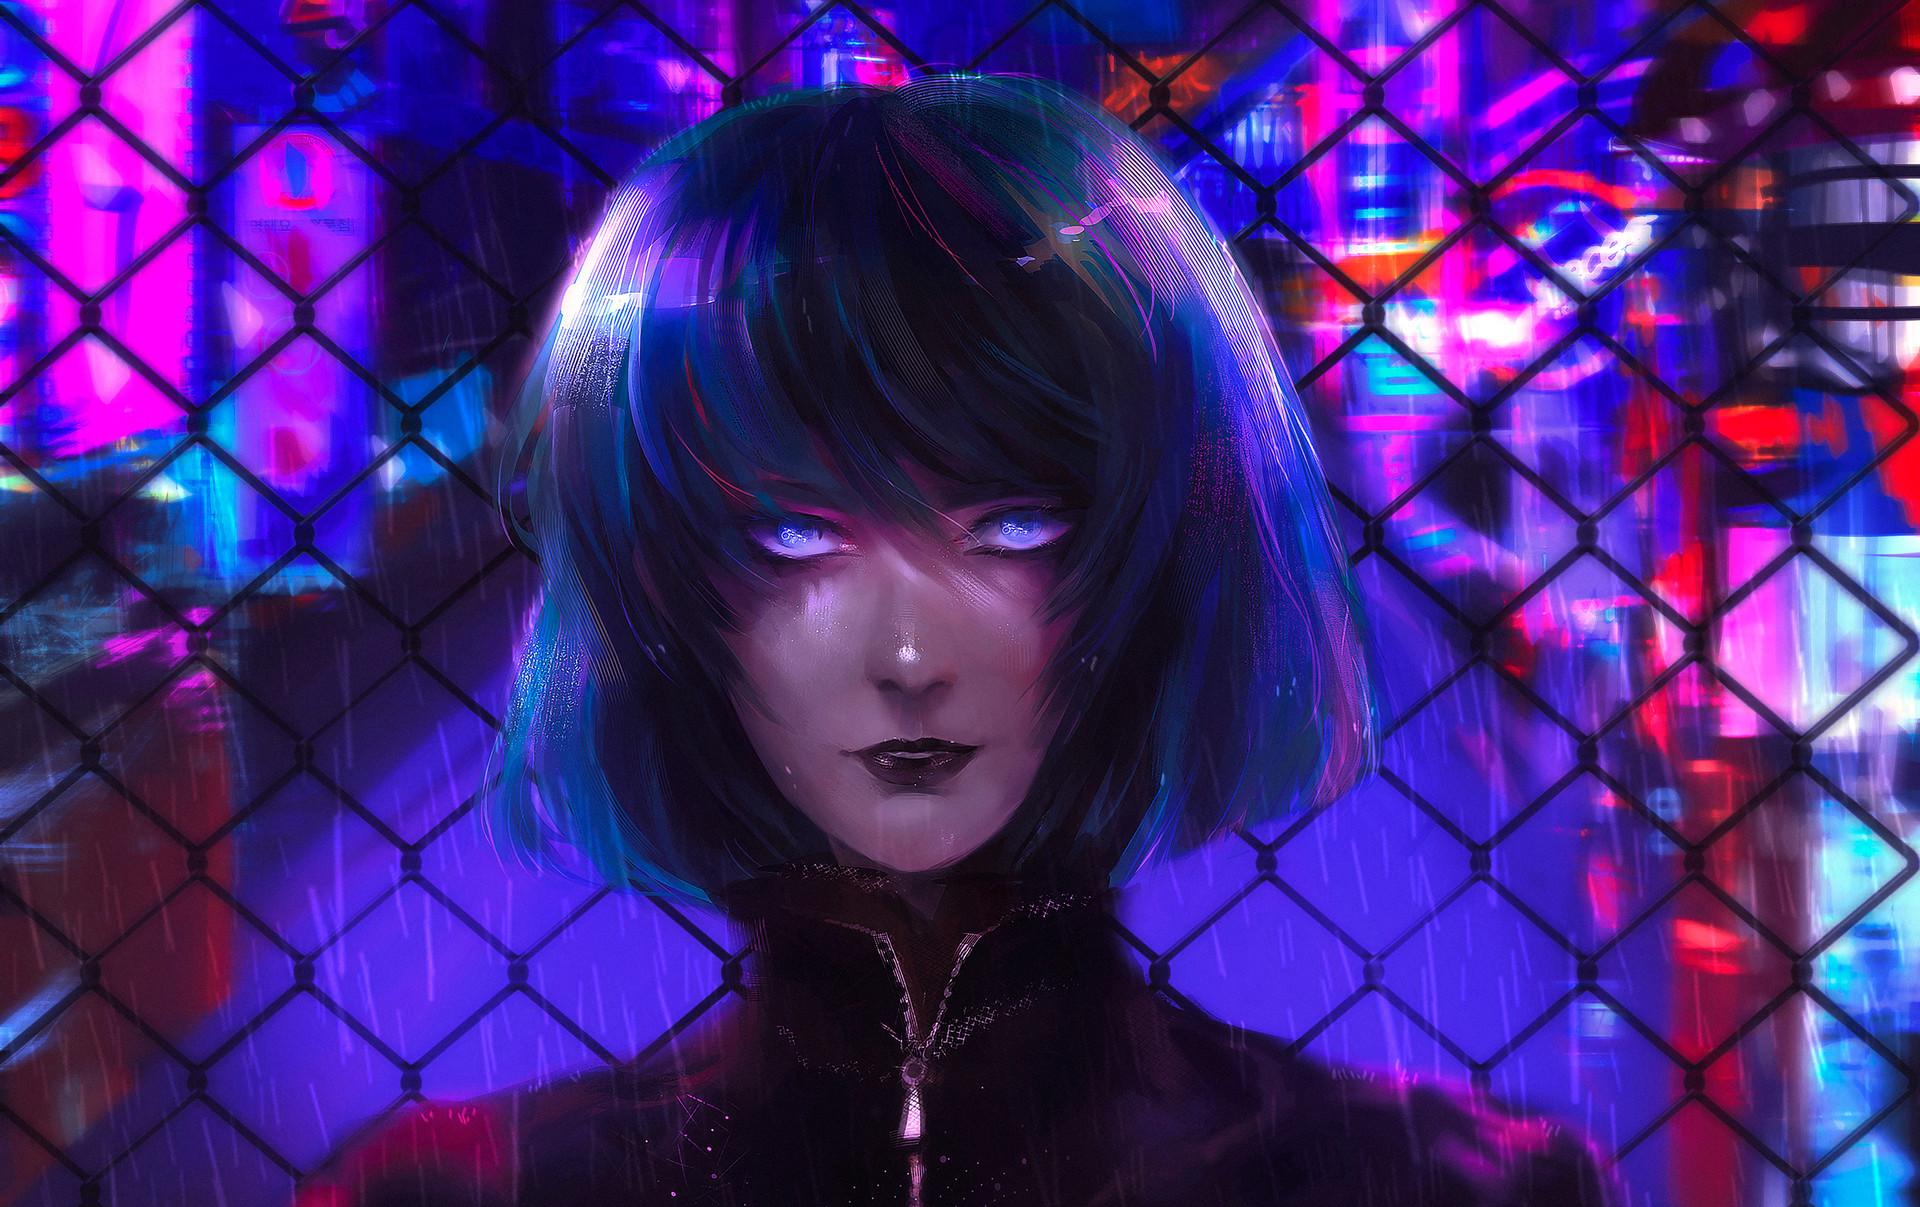 Cyberpunk Girl HD Wallpaper | Background Image | 1920x1207 ...